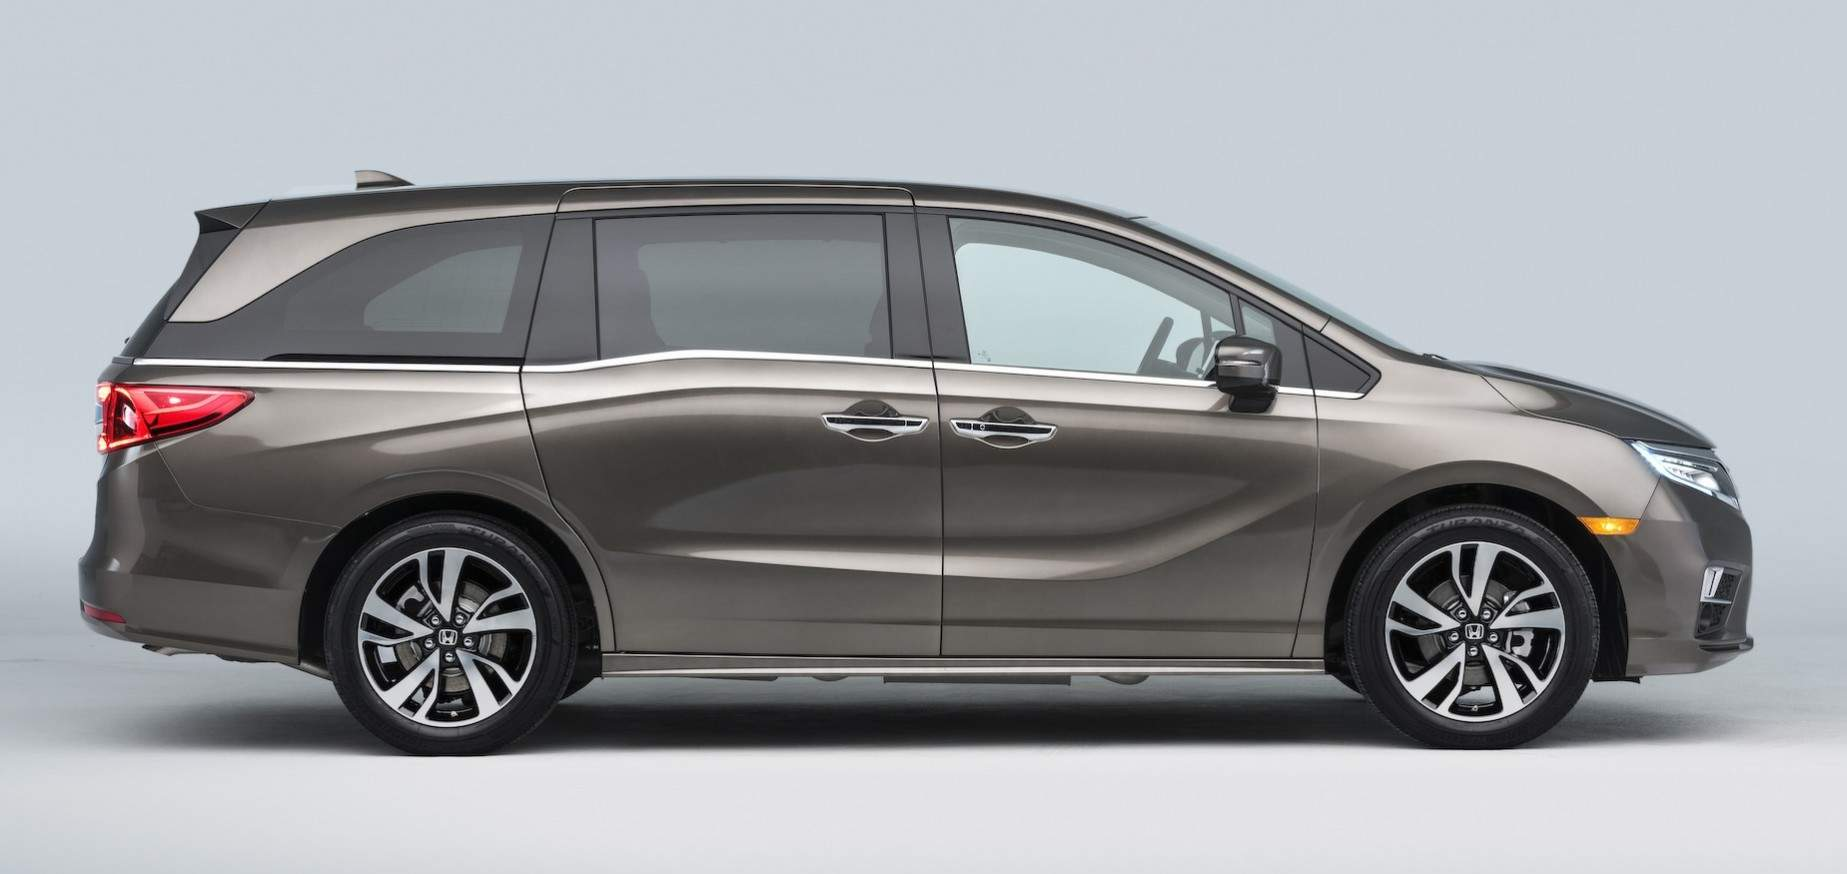 Pabrikan Mobil Honda Memamerkan Multi Purpose Vehicle (MPV) Odyssey  2018 Generasi Kelima Dalam Ajang Detroit Auto Show 2017. R